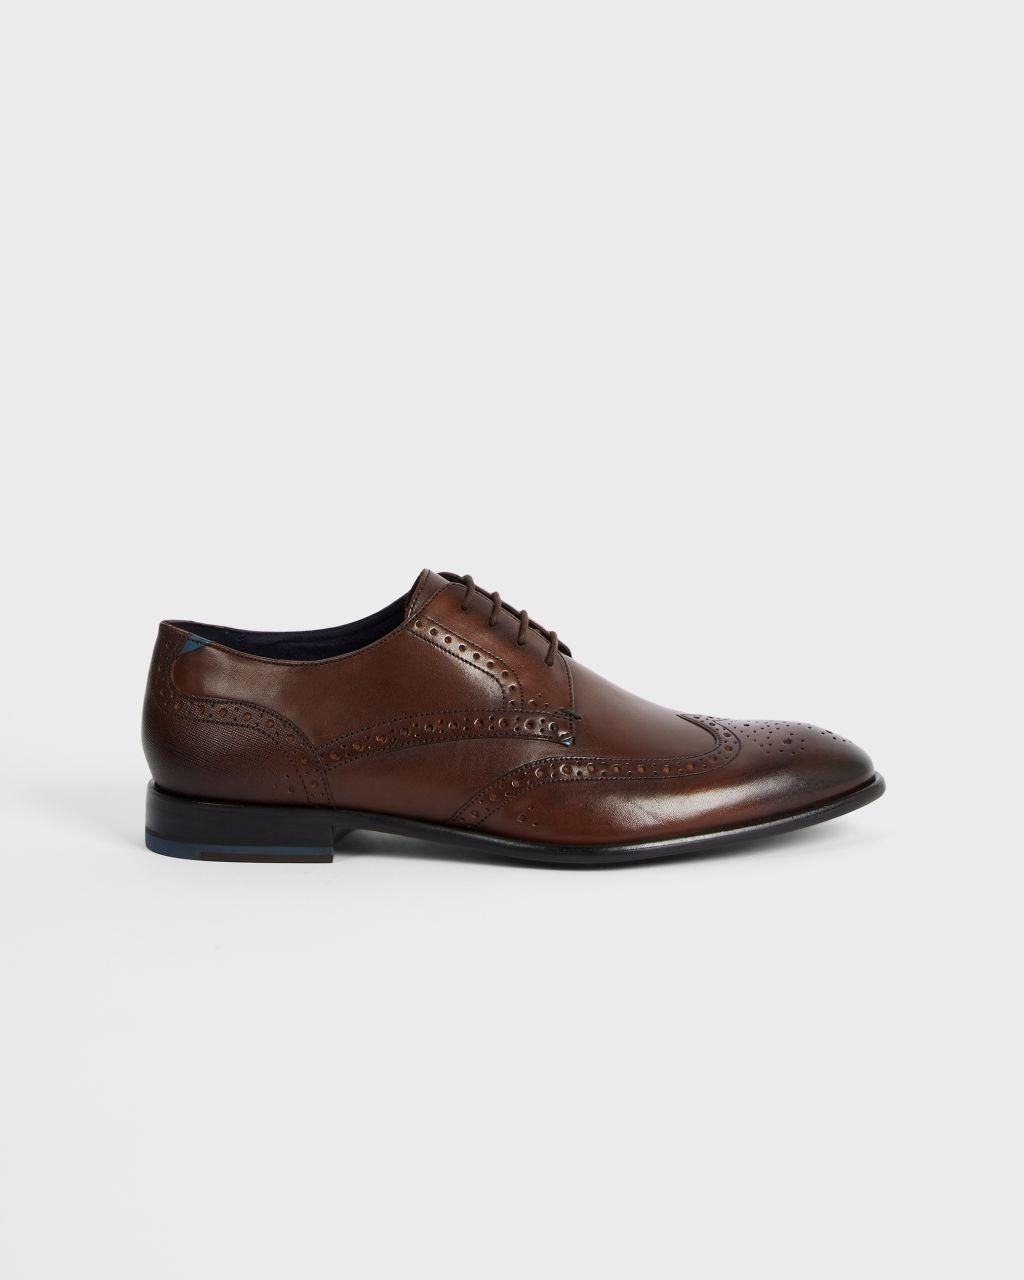 TED BAKER Brogue Shoe | TED BAKER SALE